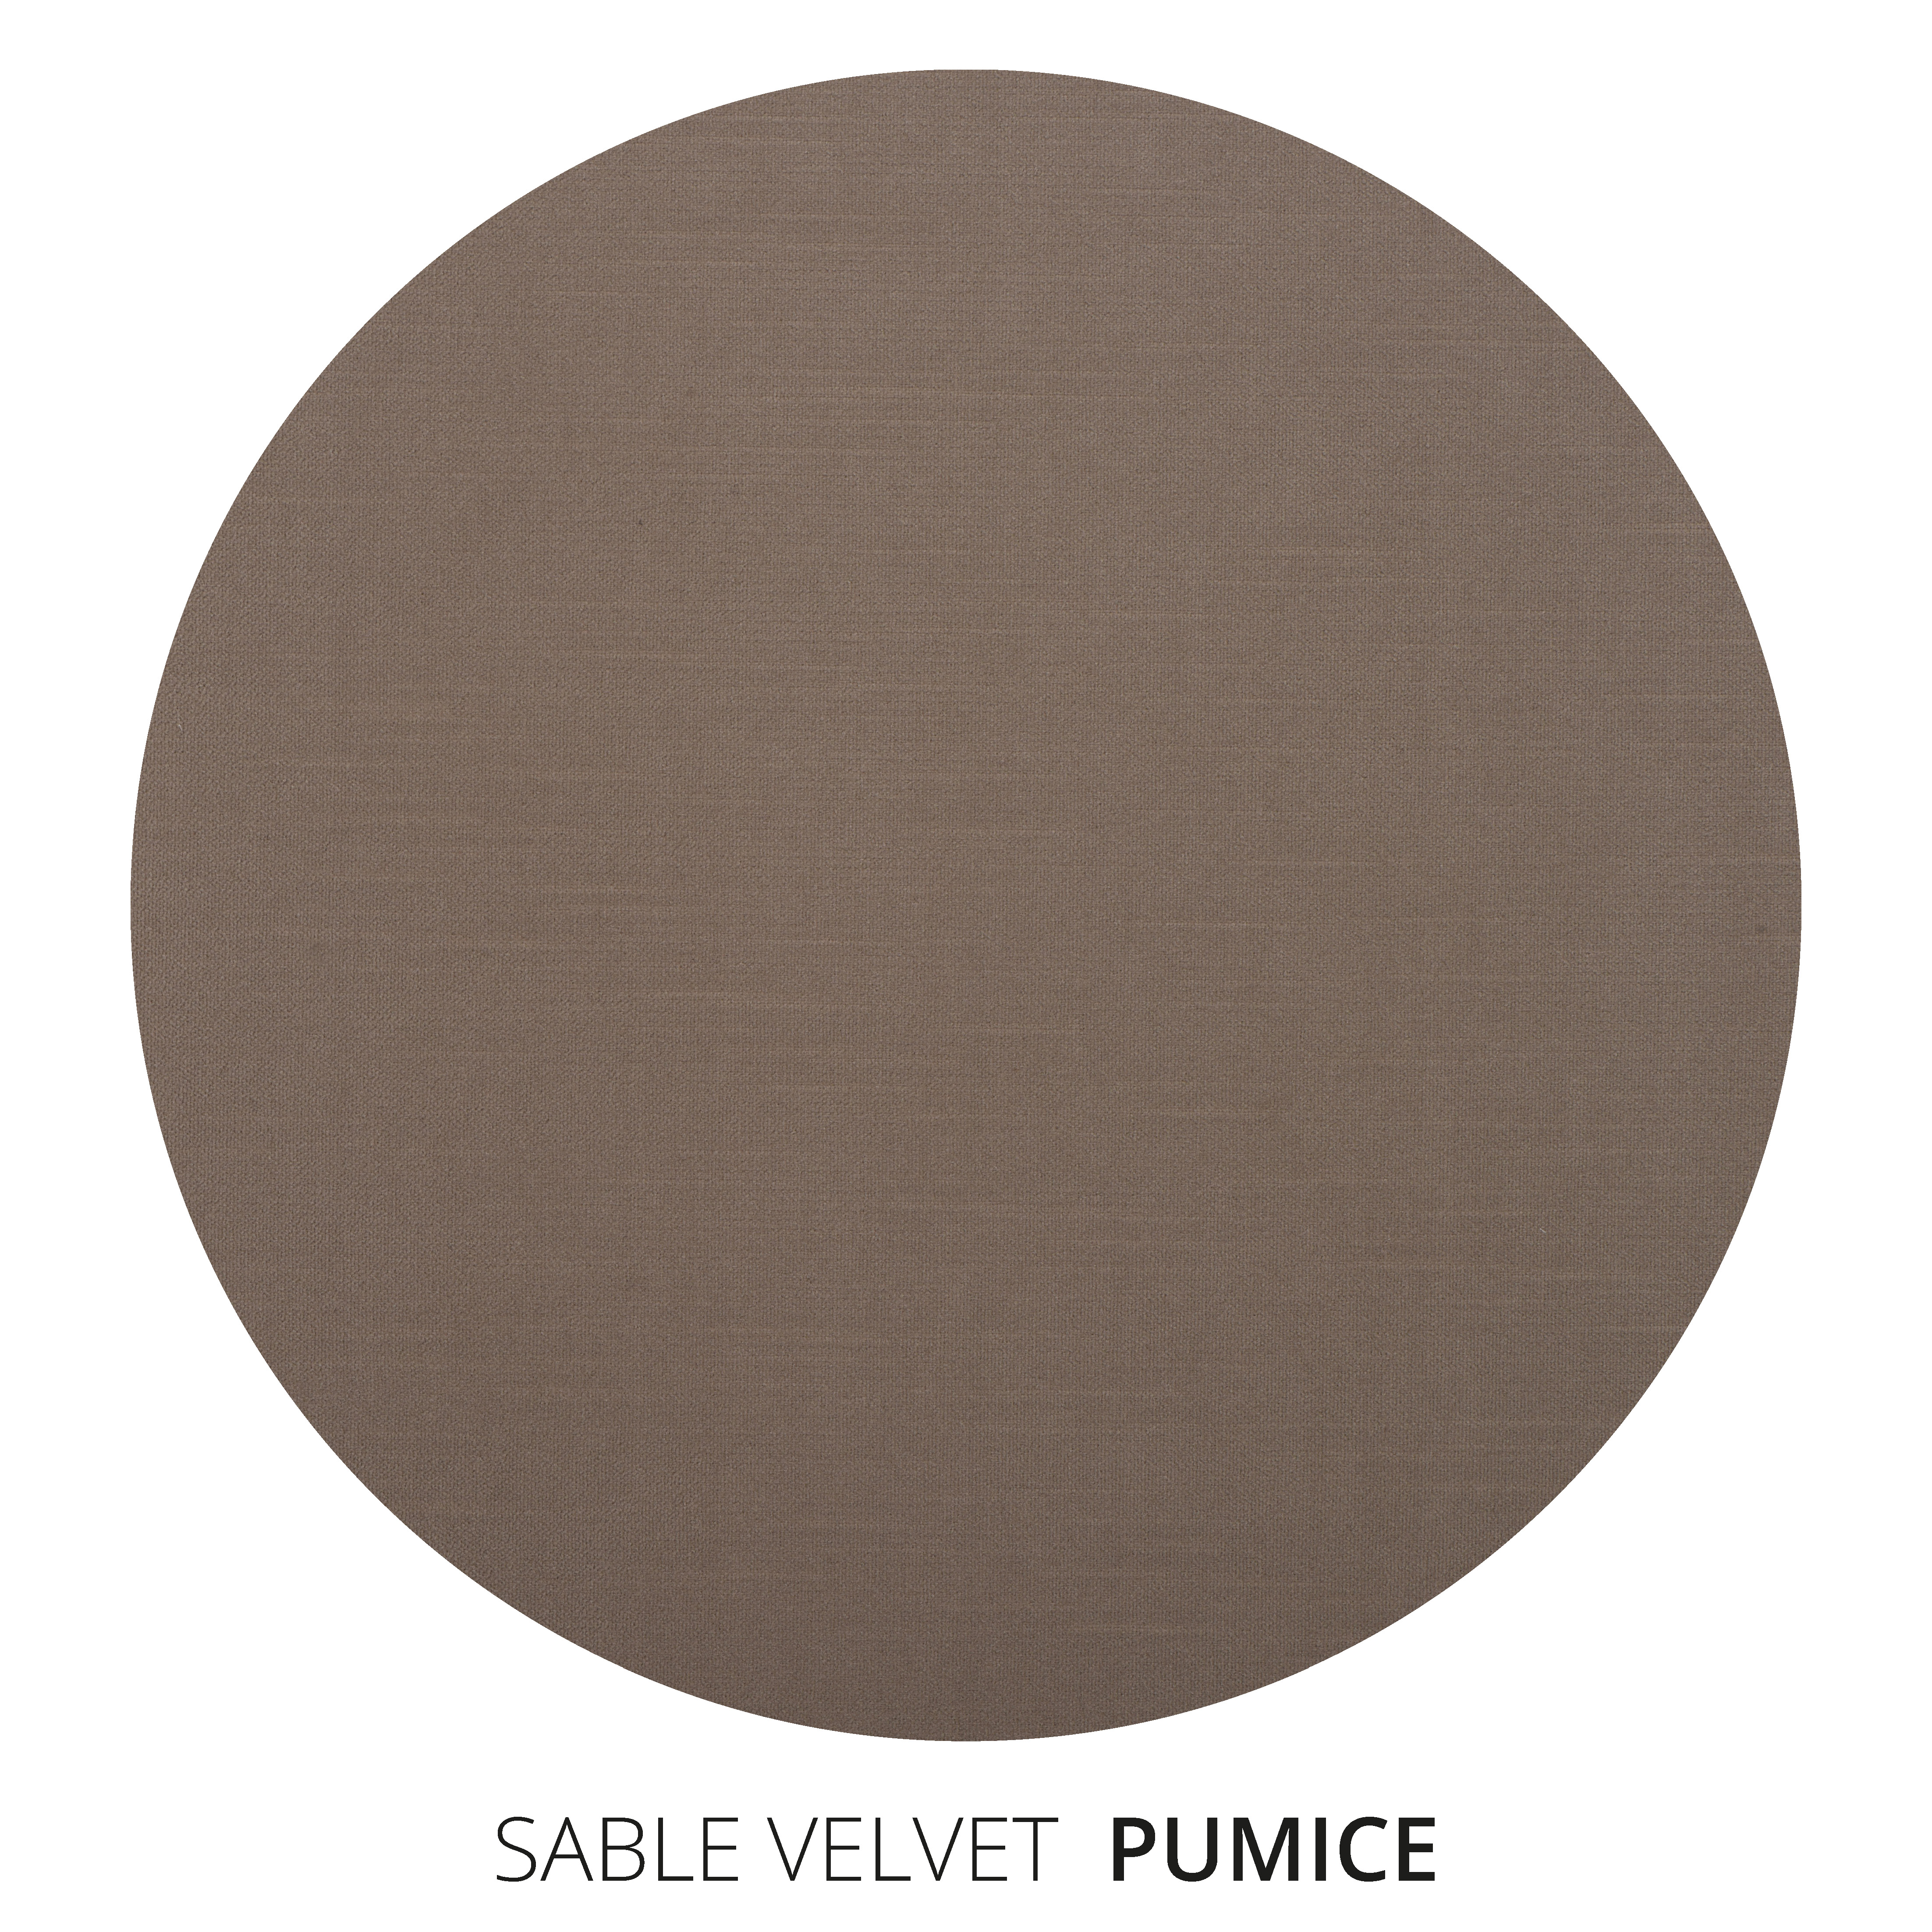 Pumice Sable Velvet Swatch